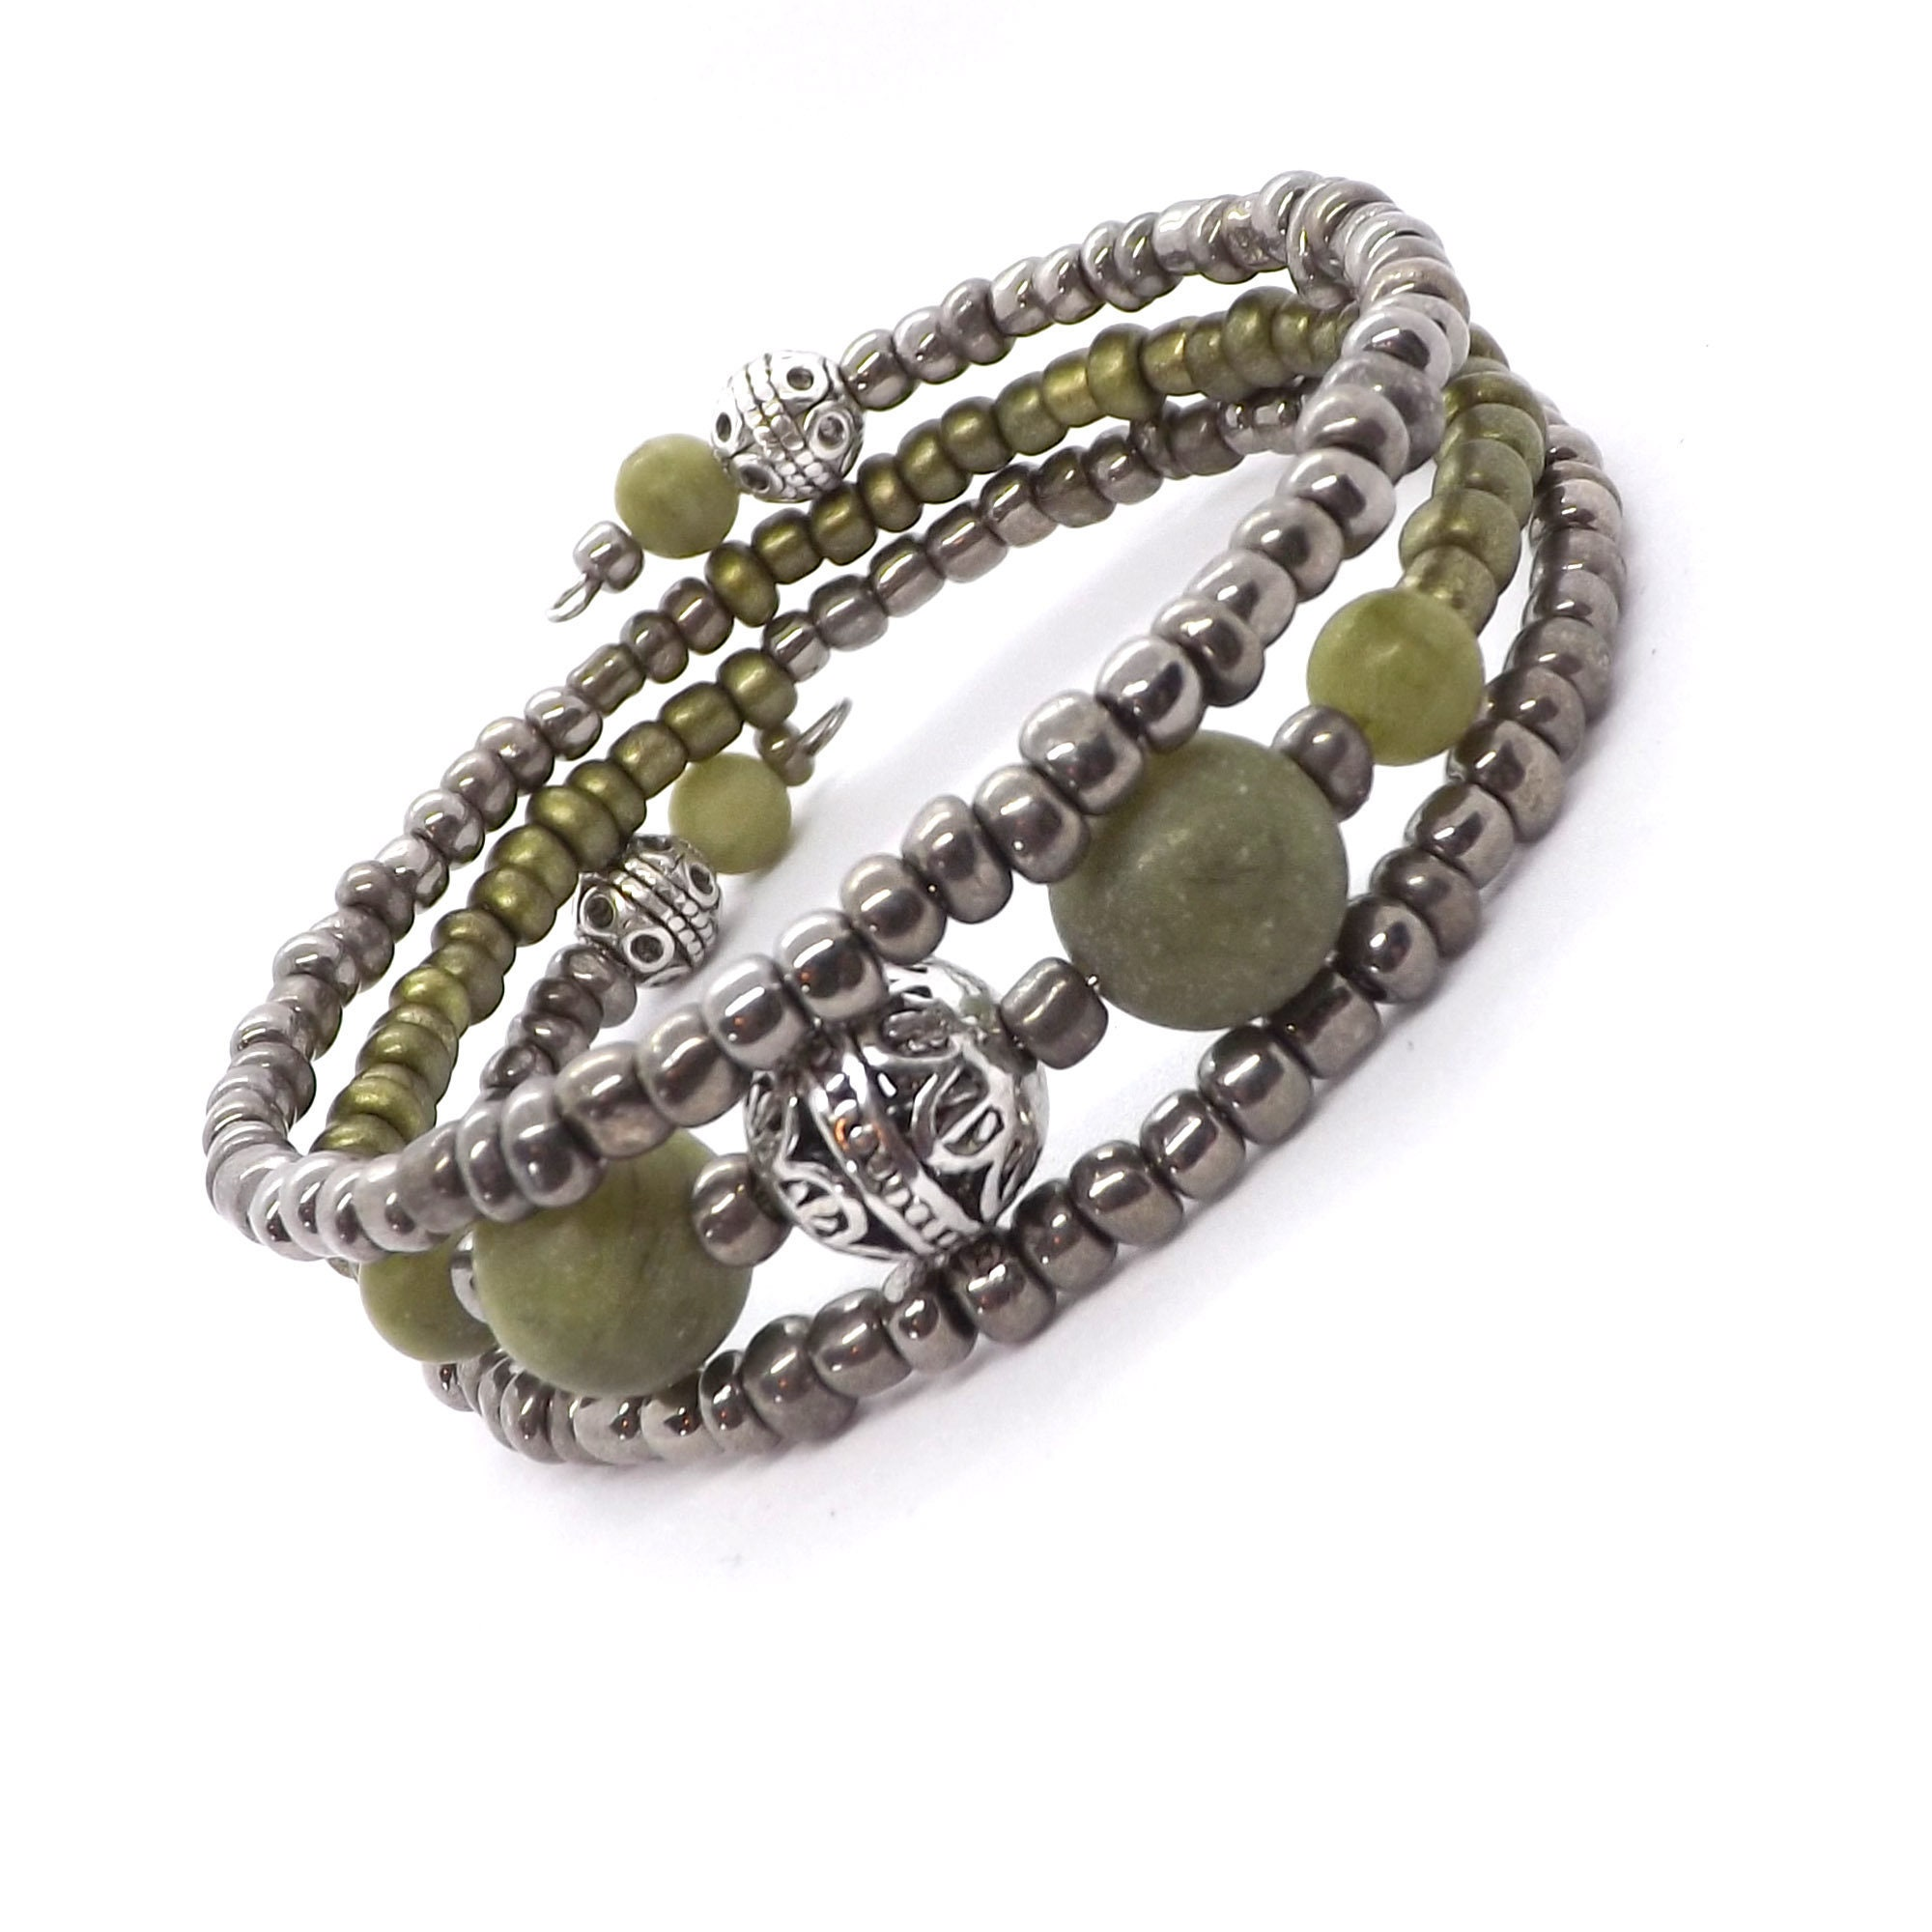 Elegant silver forged simple contemporary dainty bracelet with a boho twist handmade everyday jewelry .Green Phrenite and garnet gemstones